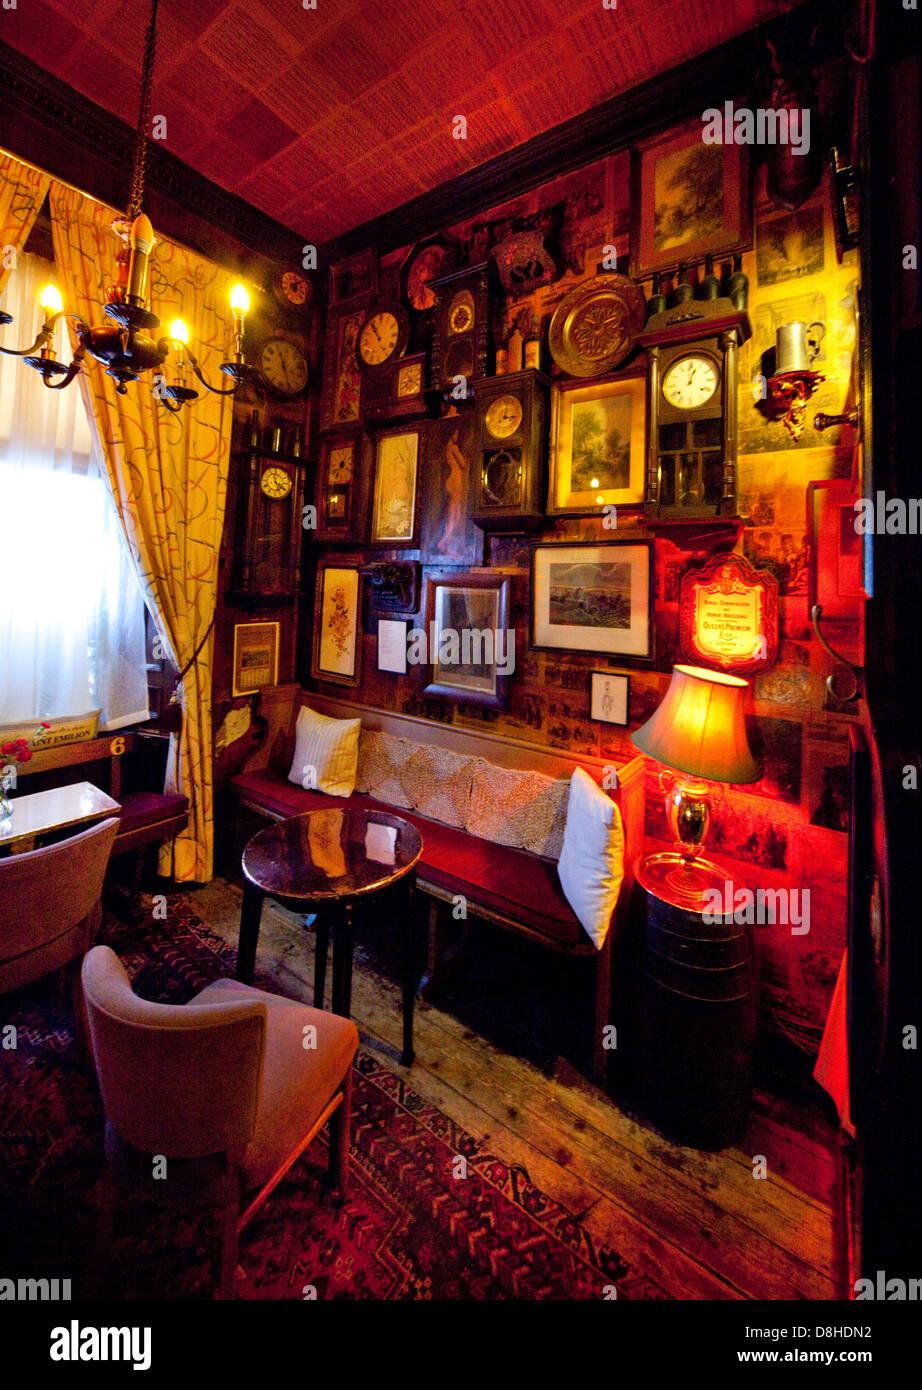 Interior, Canny Mans bar, 237 Morningside Rd, Edinburgh, Scotland, UK  EH10 4QU - Stock Image